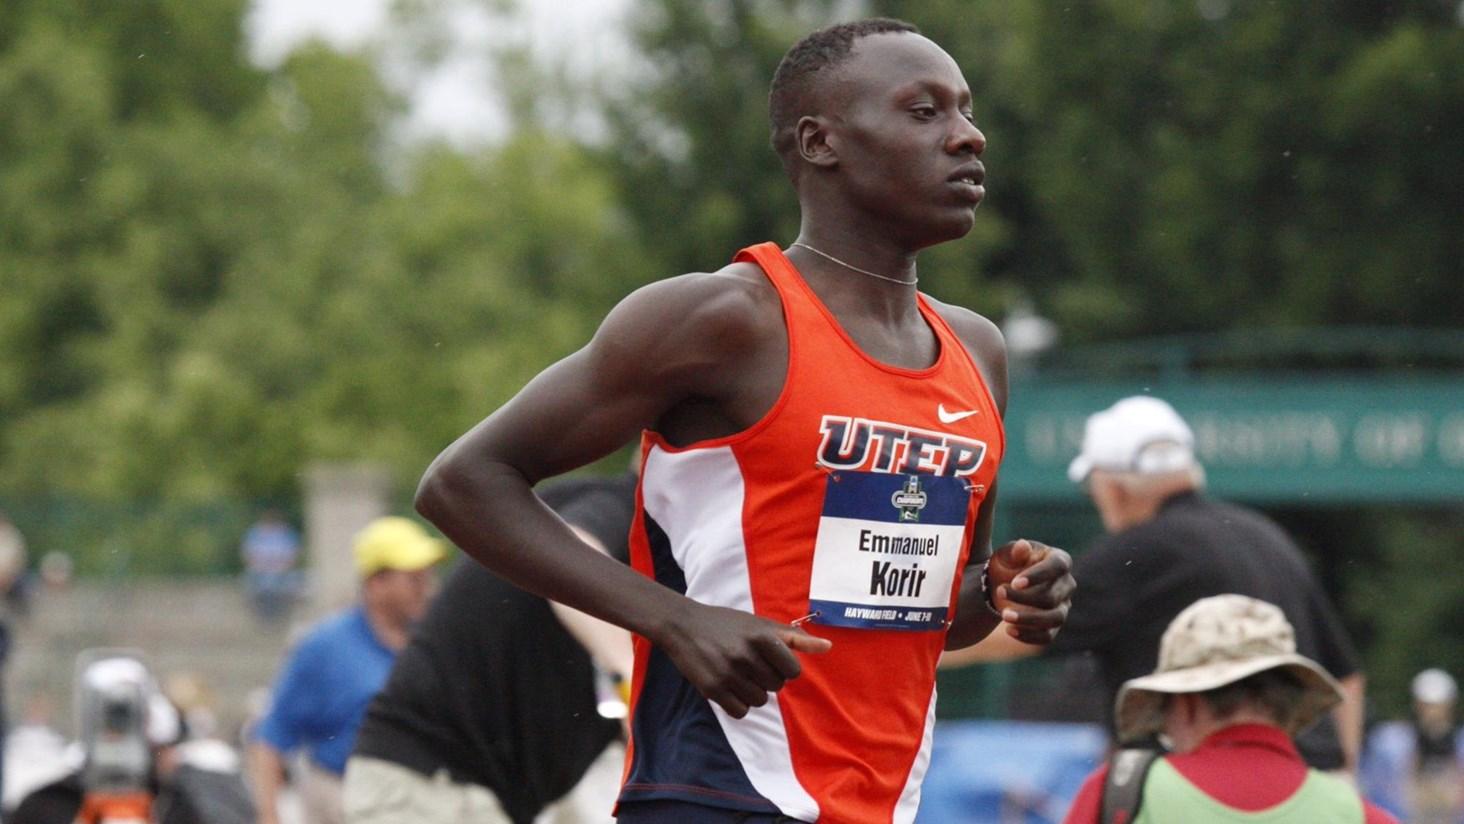 Kenyan runner Korir ready to scrap 2020 athletics season - Sports Leo